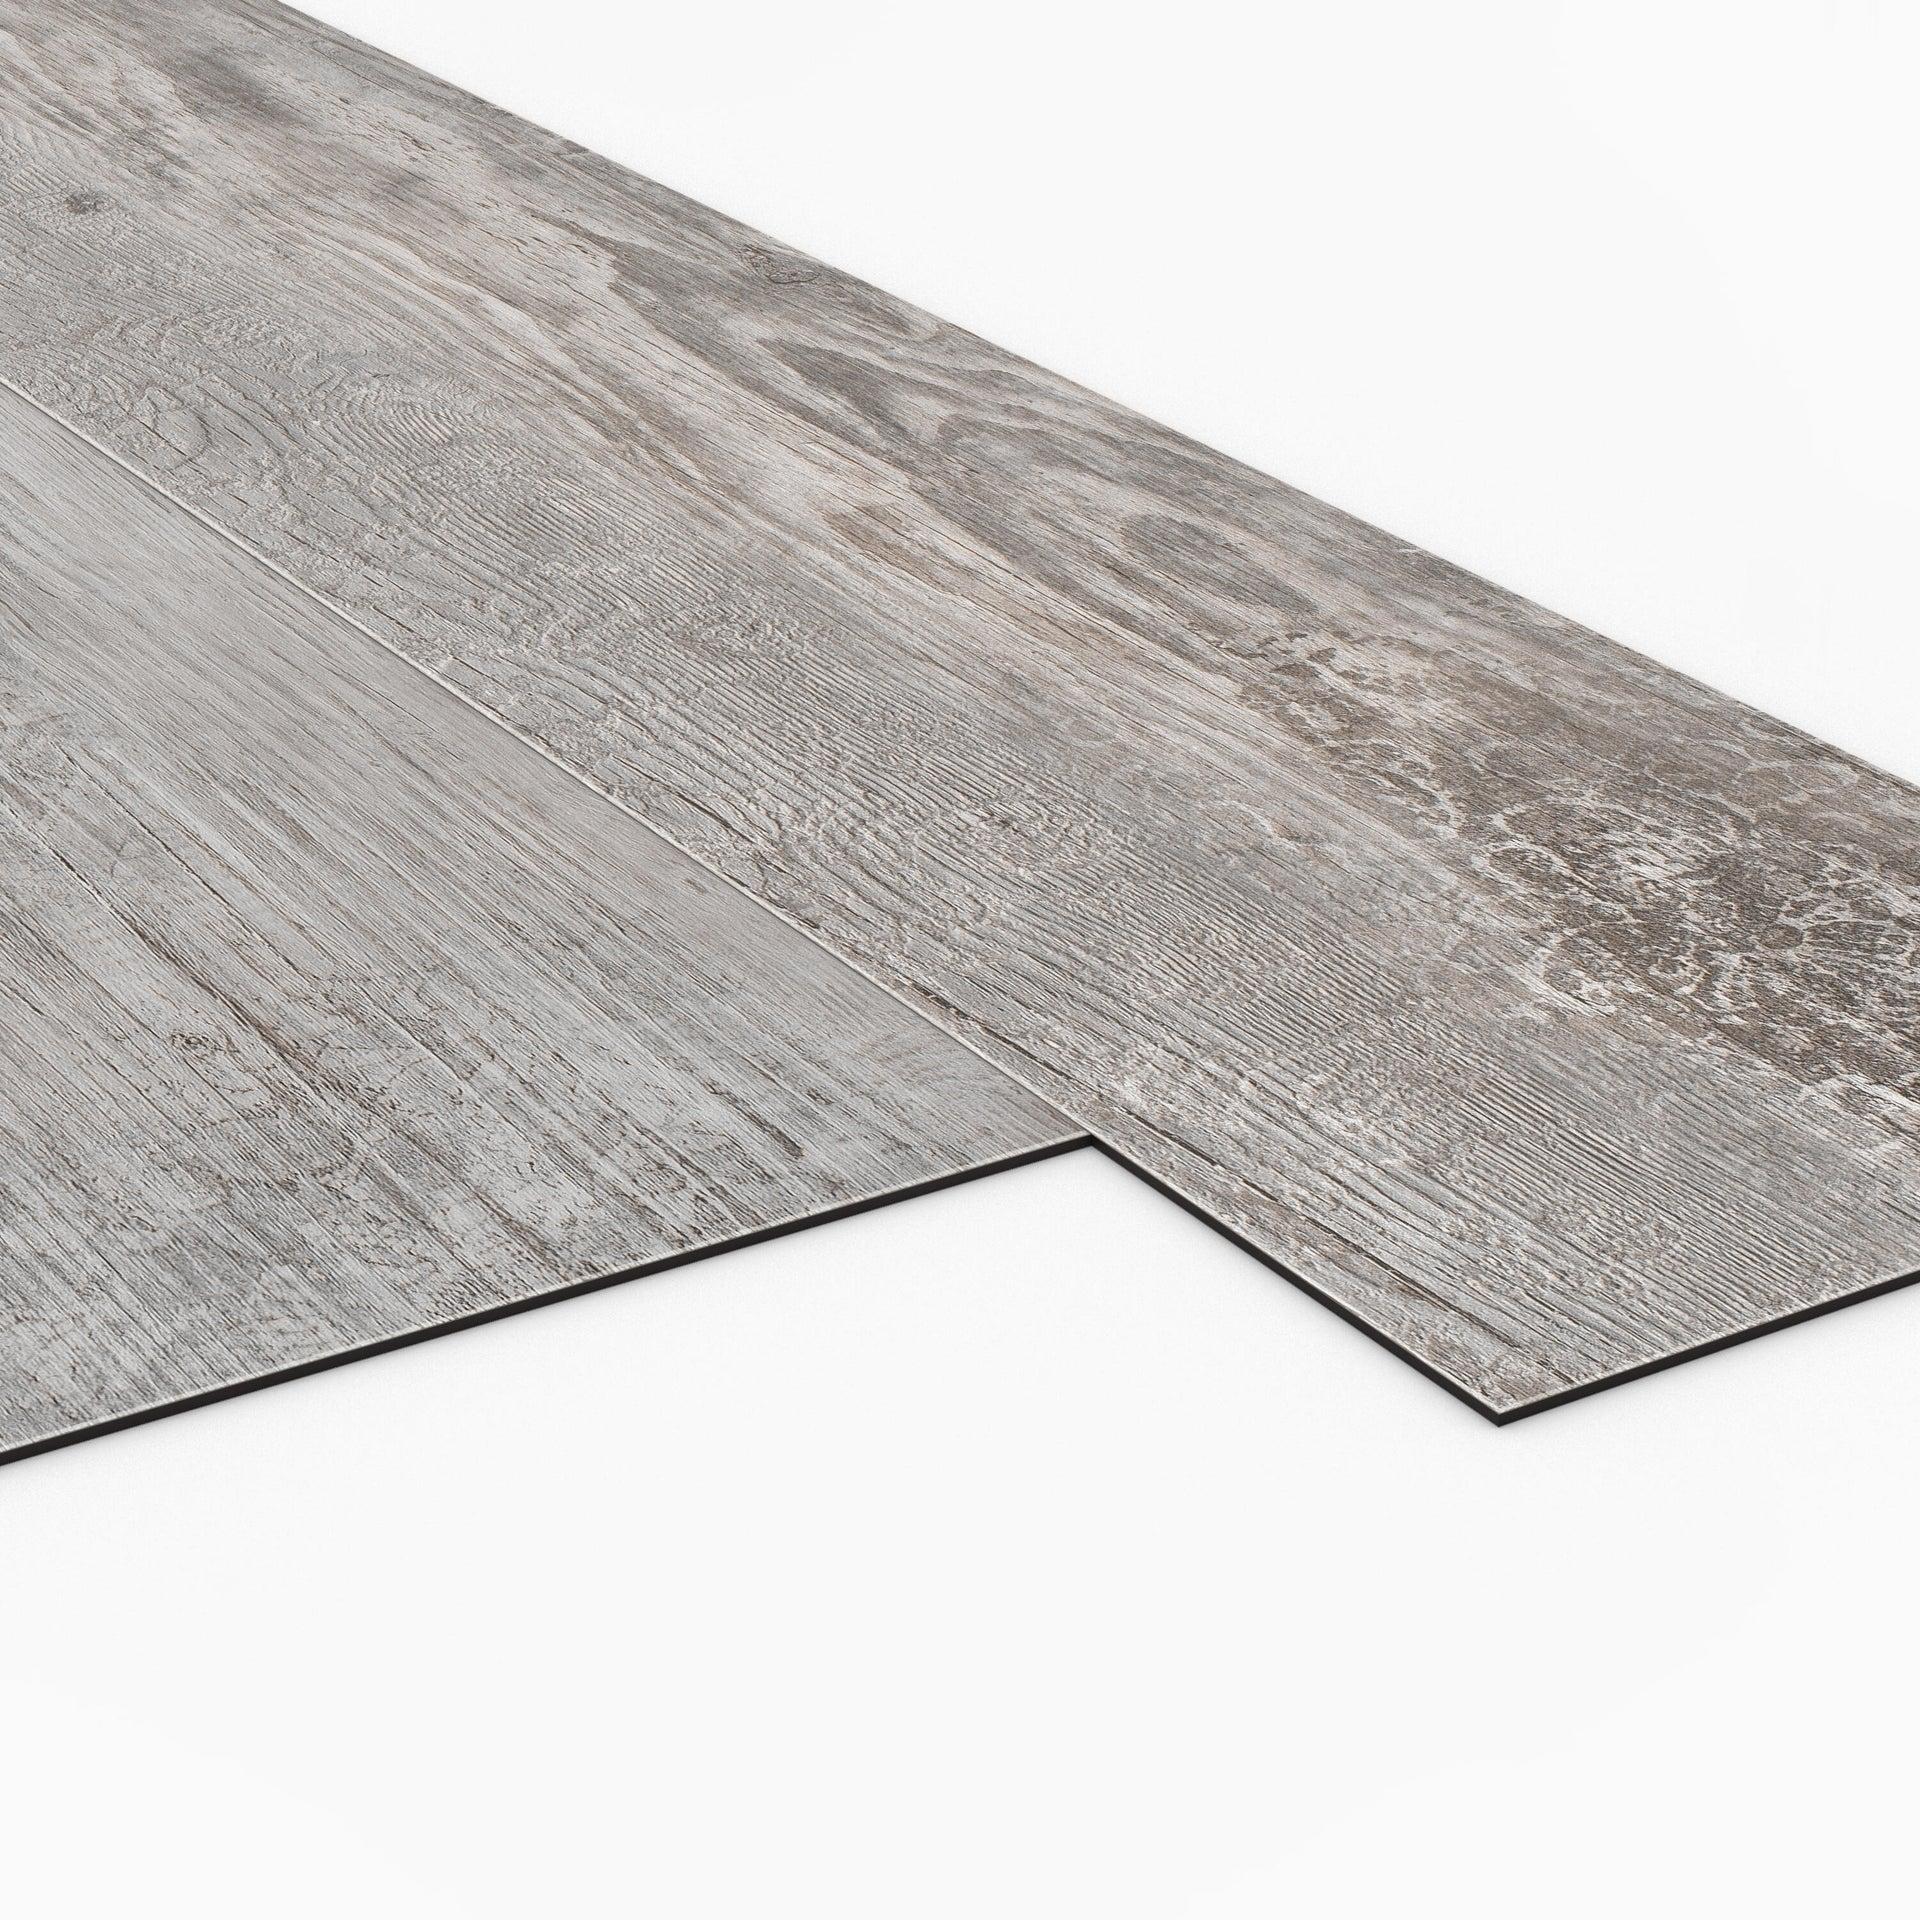 Pavimento PVC adesivo Senso Romance Sp 2.5 mm beige - 6